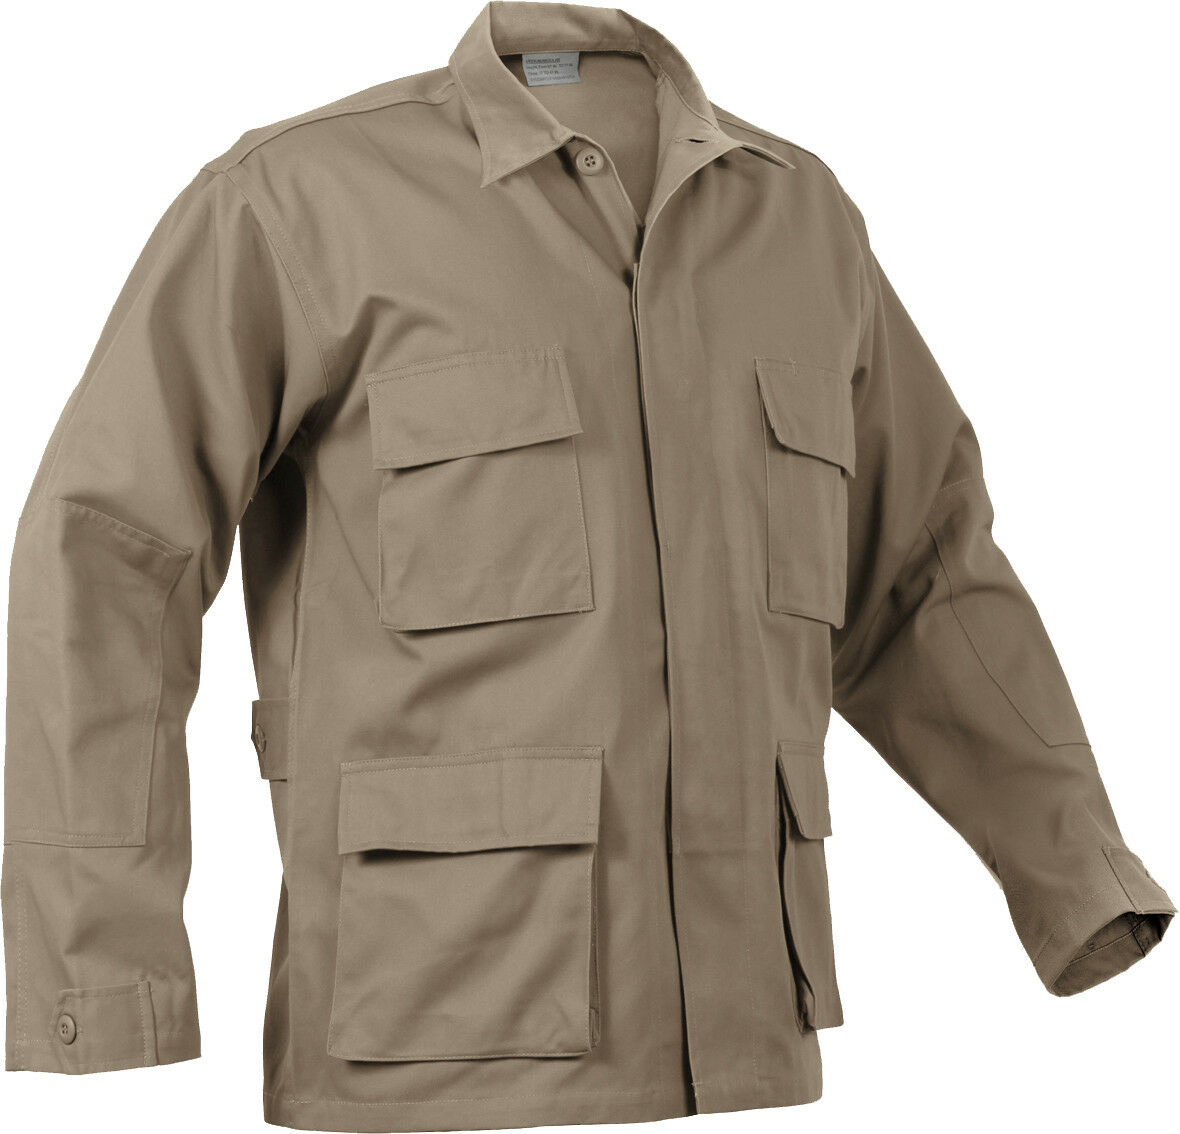 Mens Khaki Solid Long Sleeve Military BDU Shirt Coat Uniform Army Fatigues